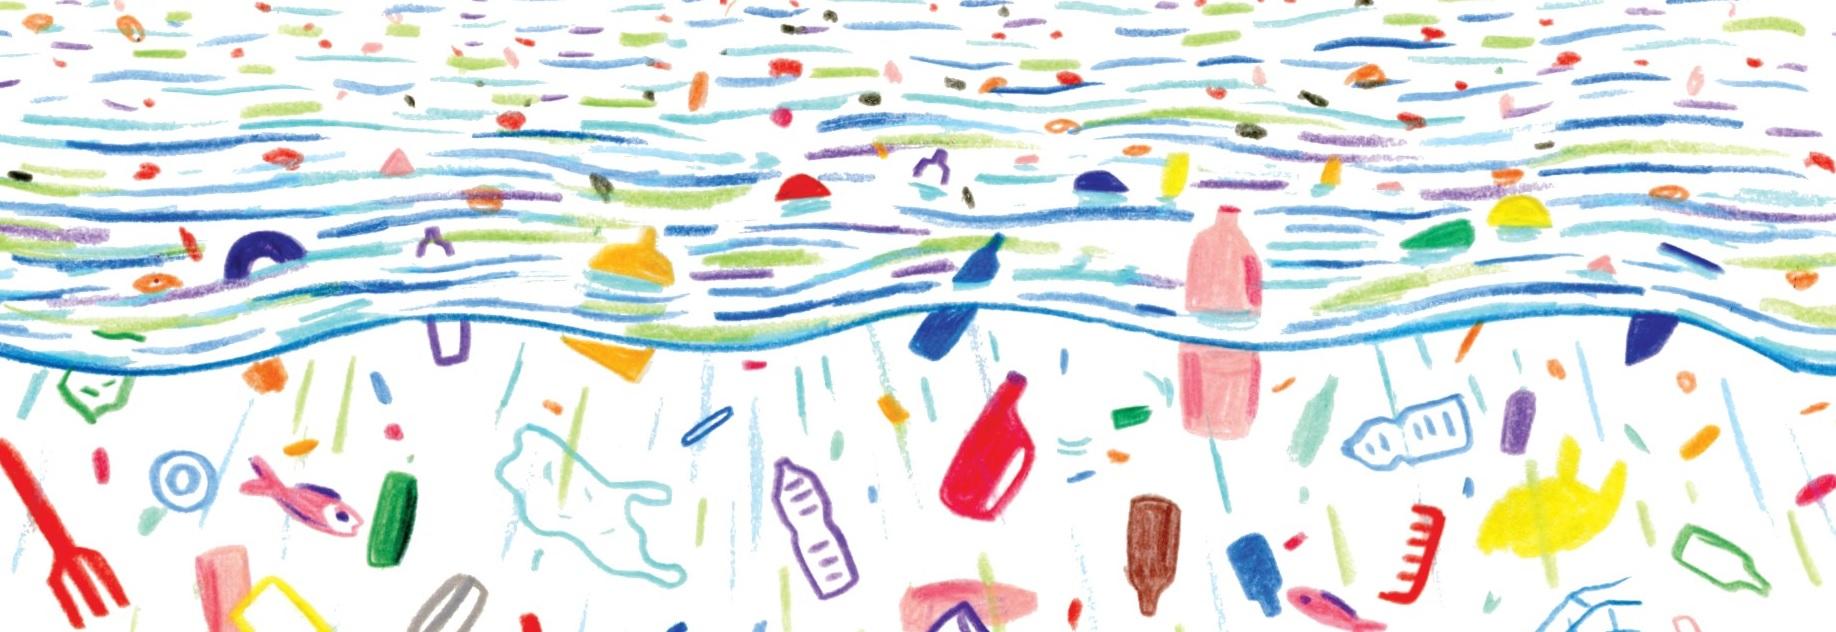 plast v oceánech